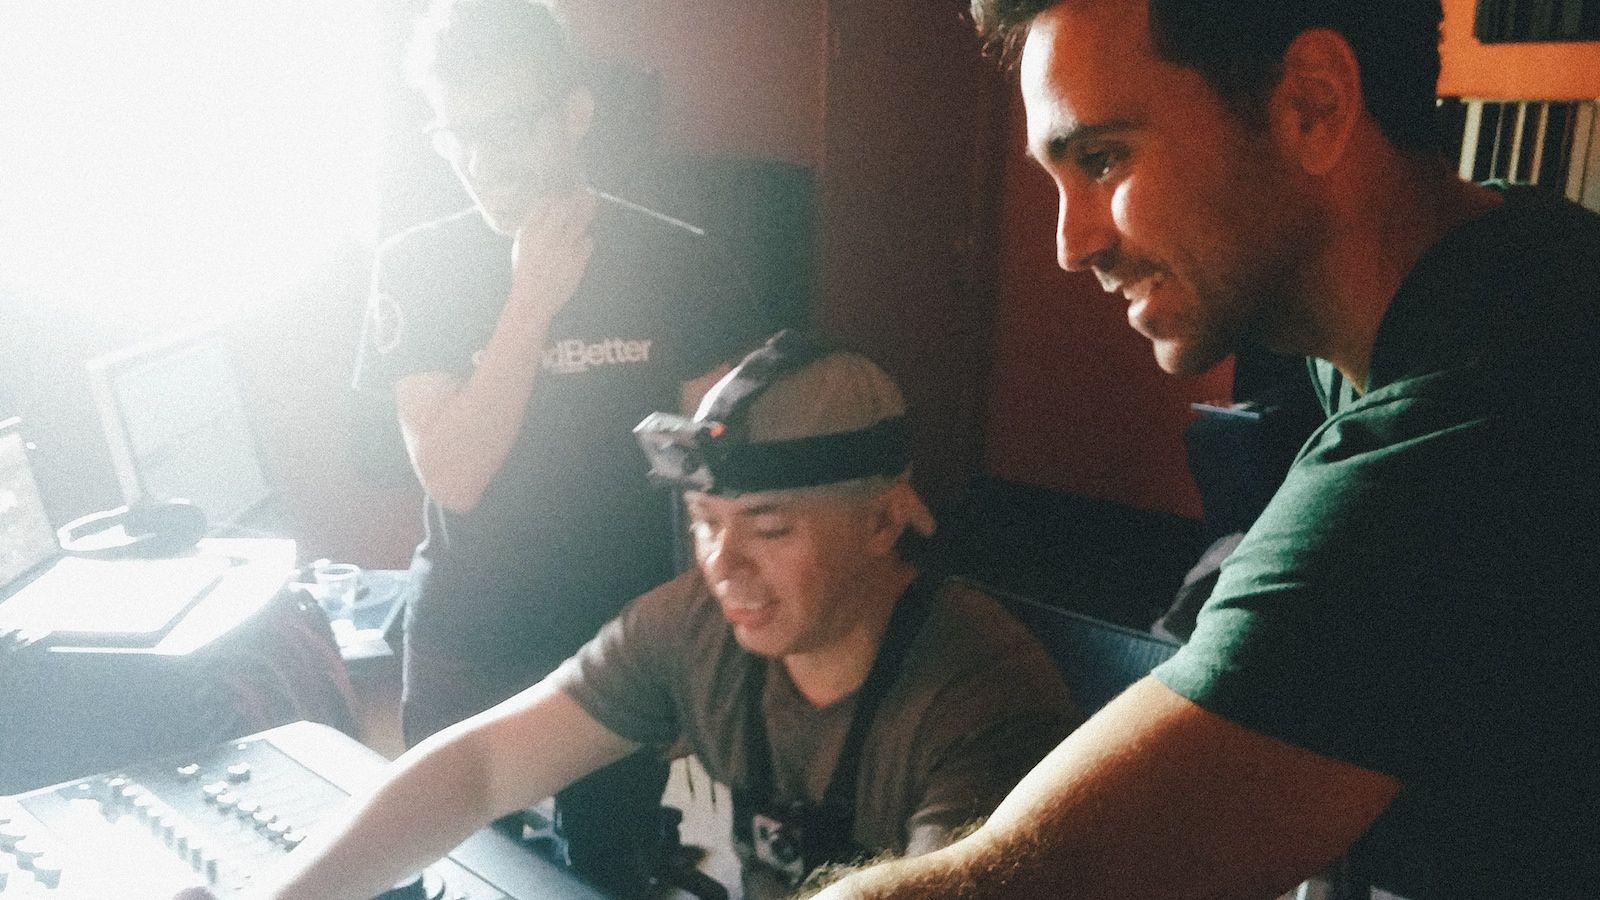 Music Producers POV - Luca Pretolesi - Image 1